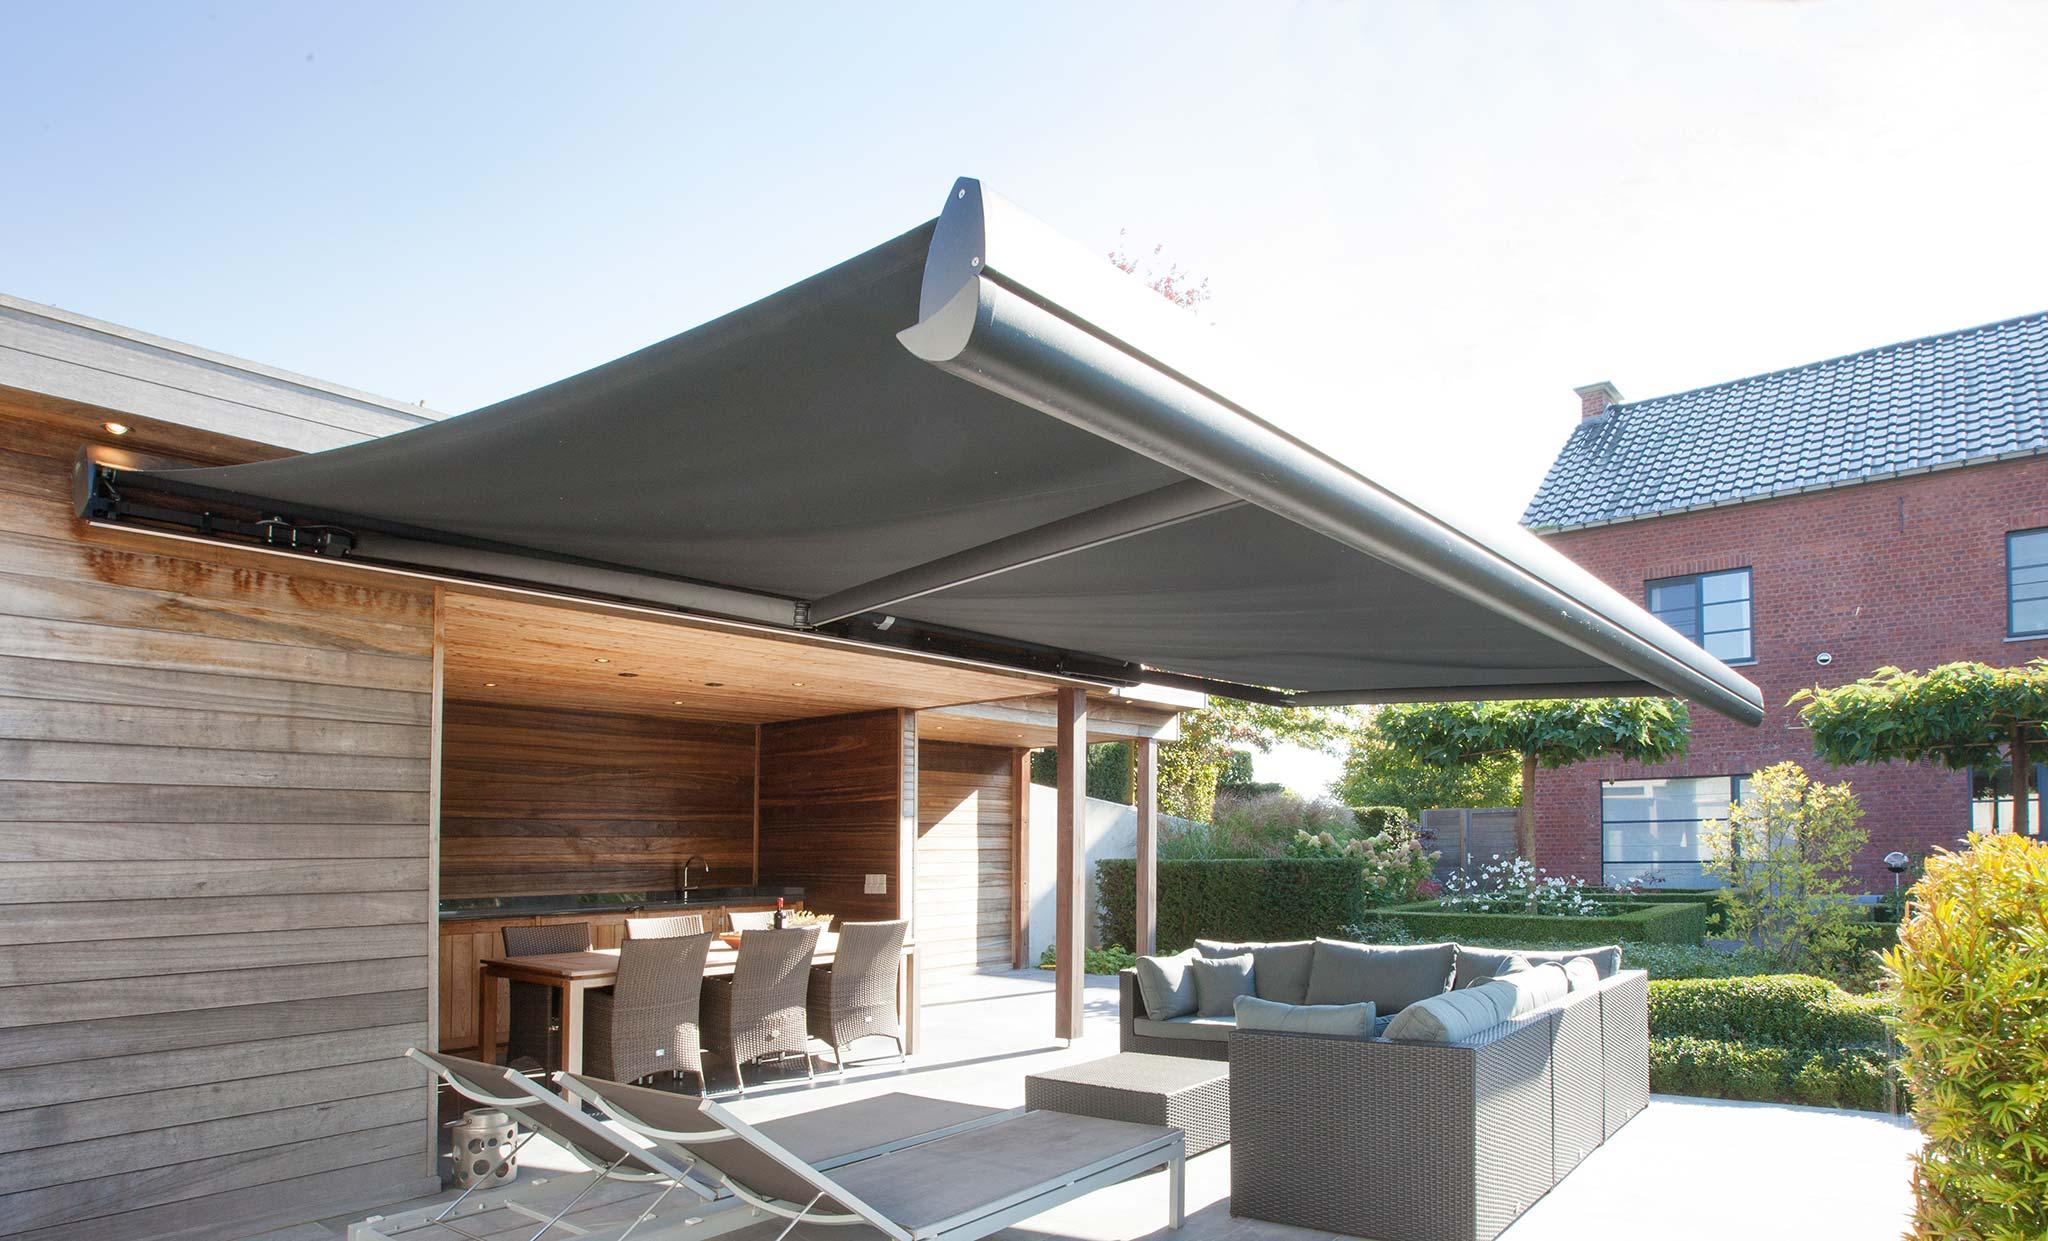 robuust scherm tot 4 m uitval lx530 harol. Black Bedroom Furniture Sets. Home Design Ideas